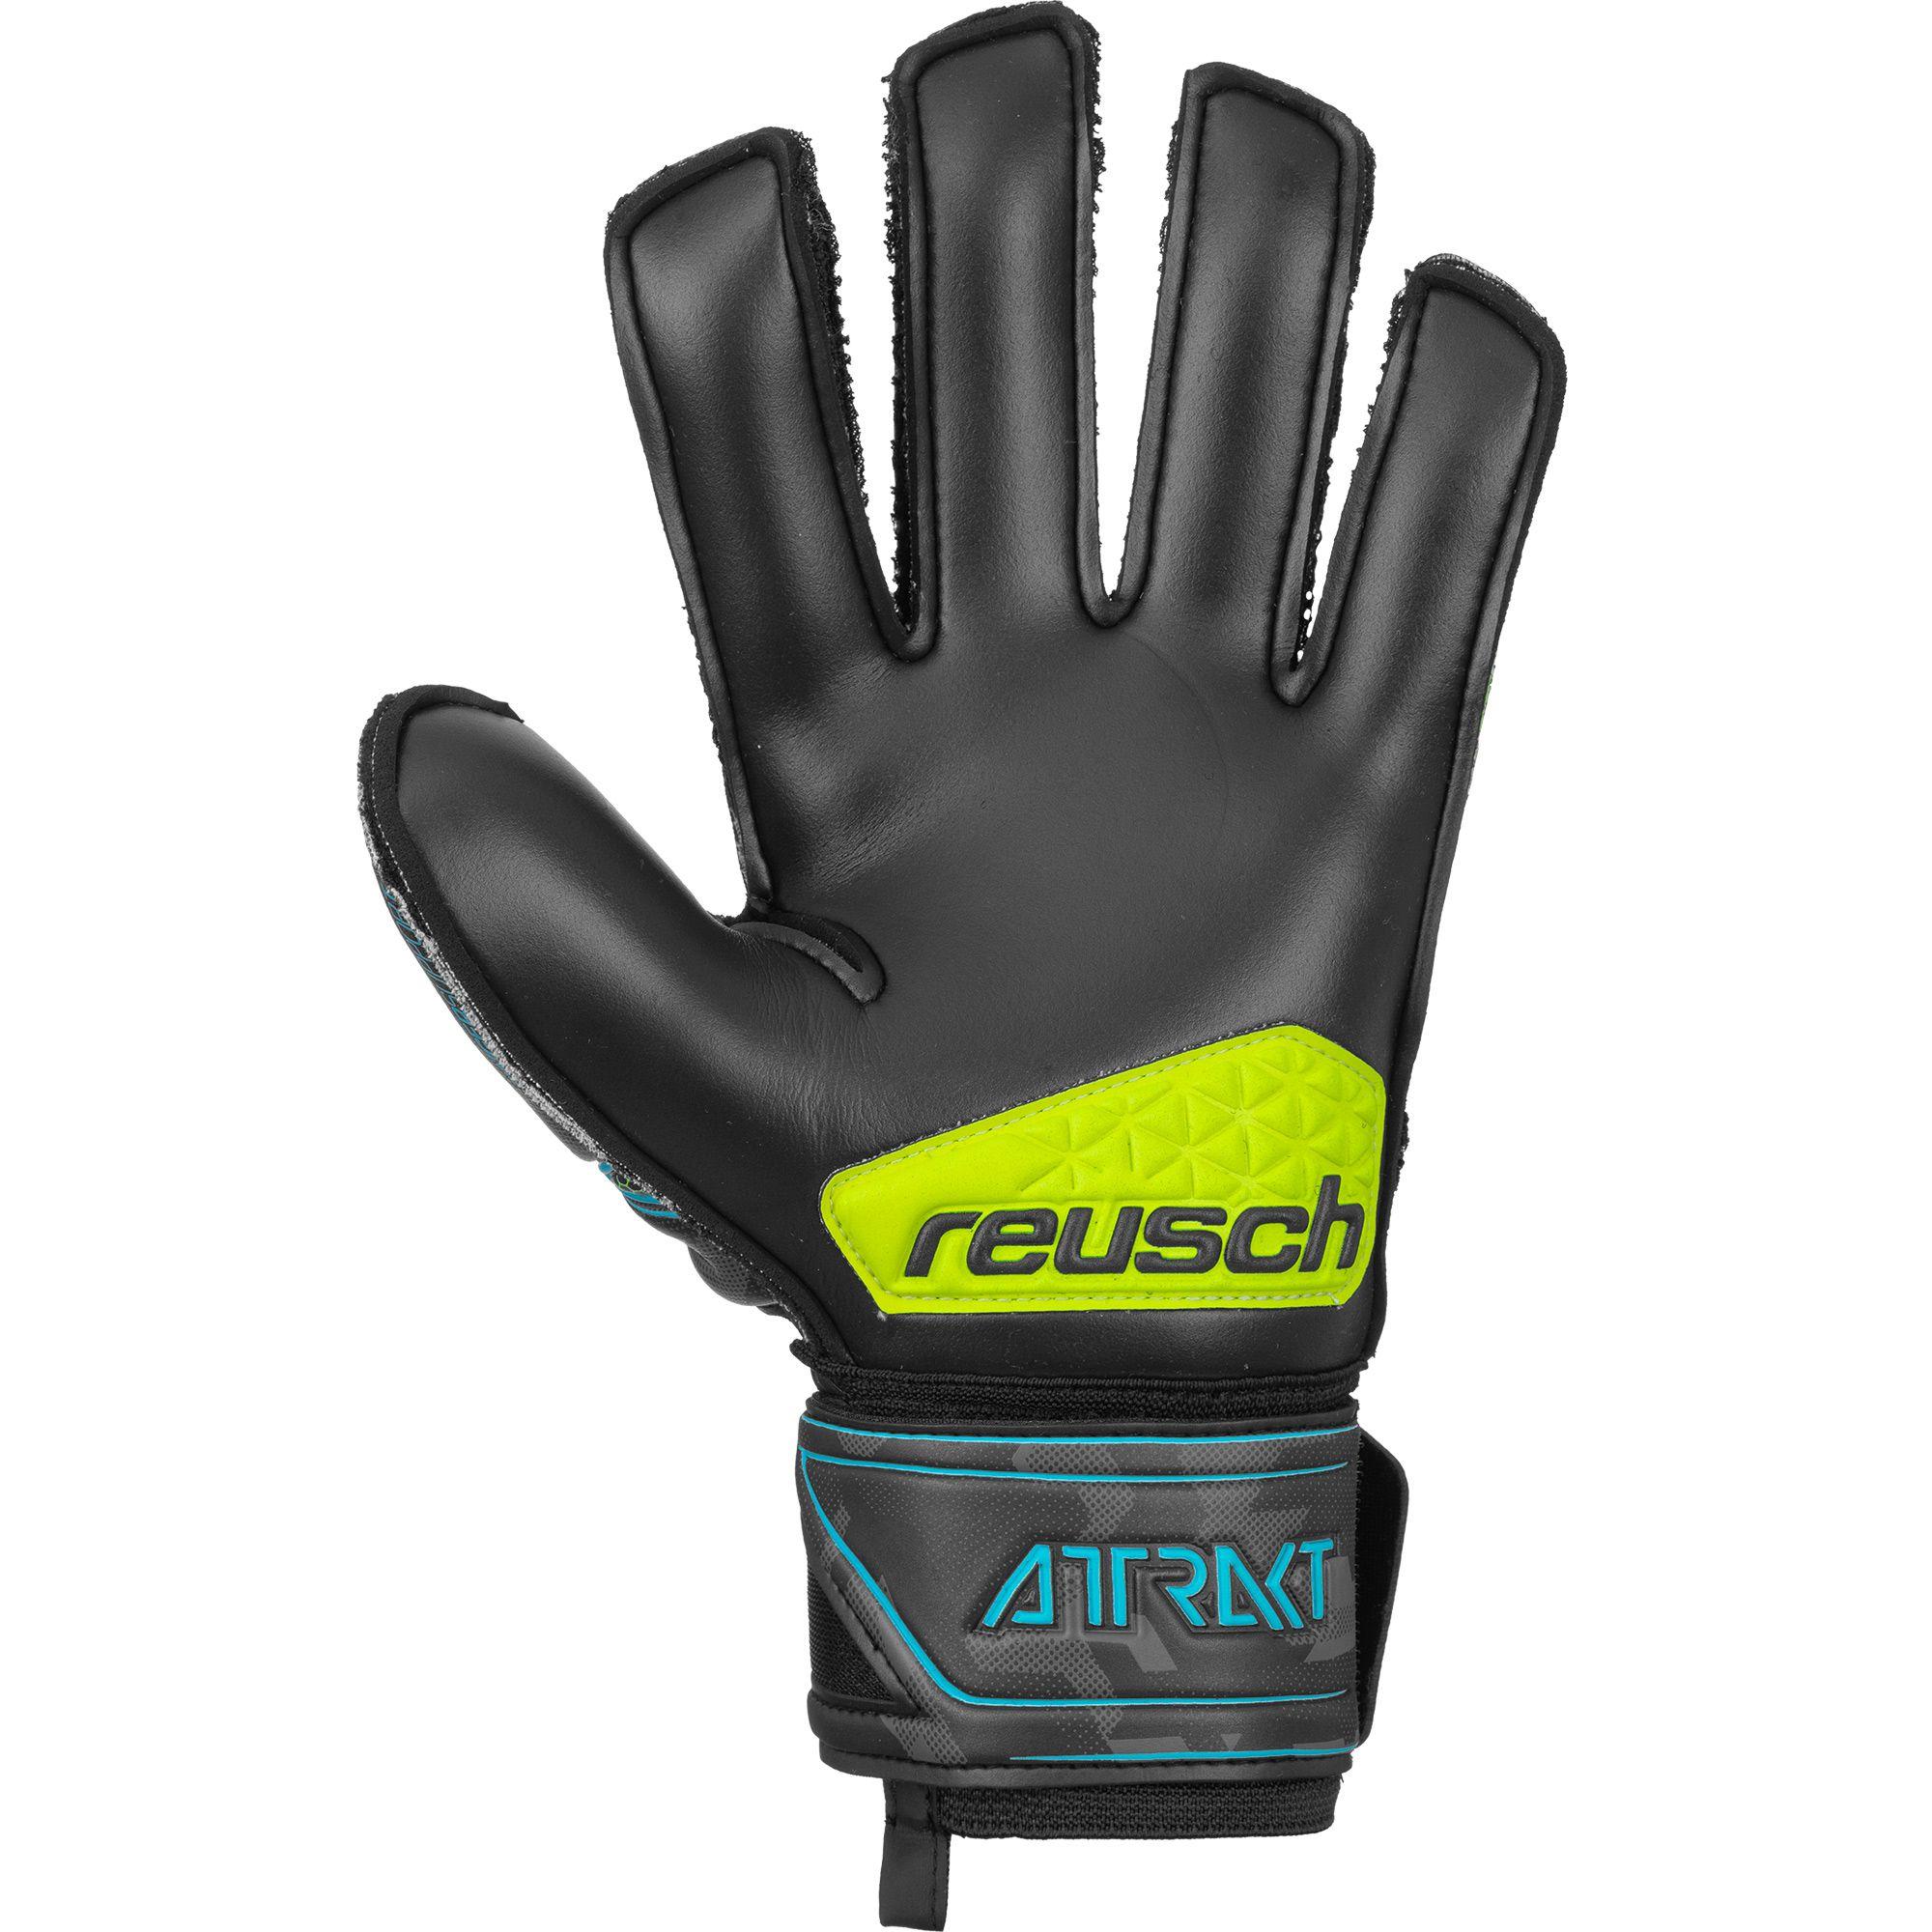 Gants Reusch Attrakt R3 Finger Support (barettes) 2020